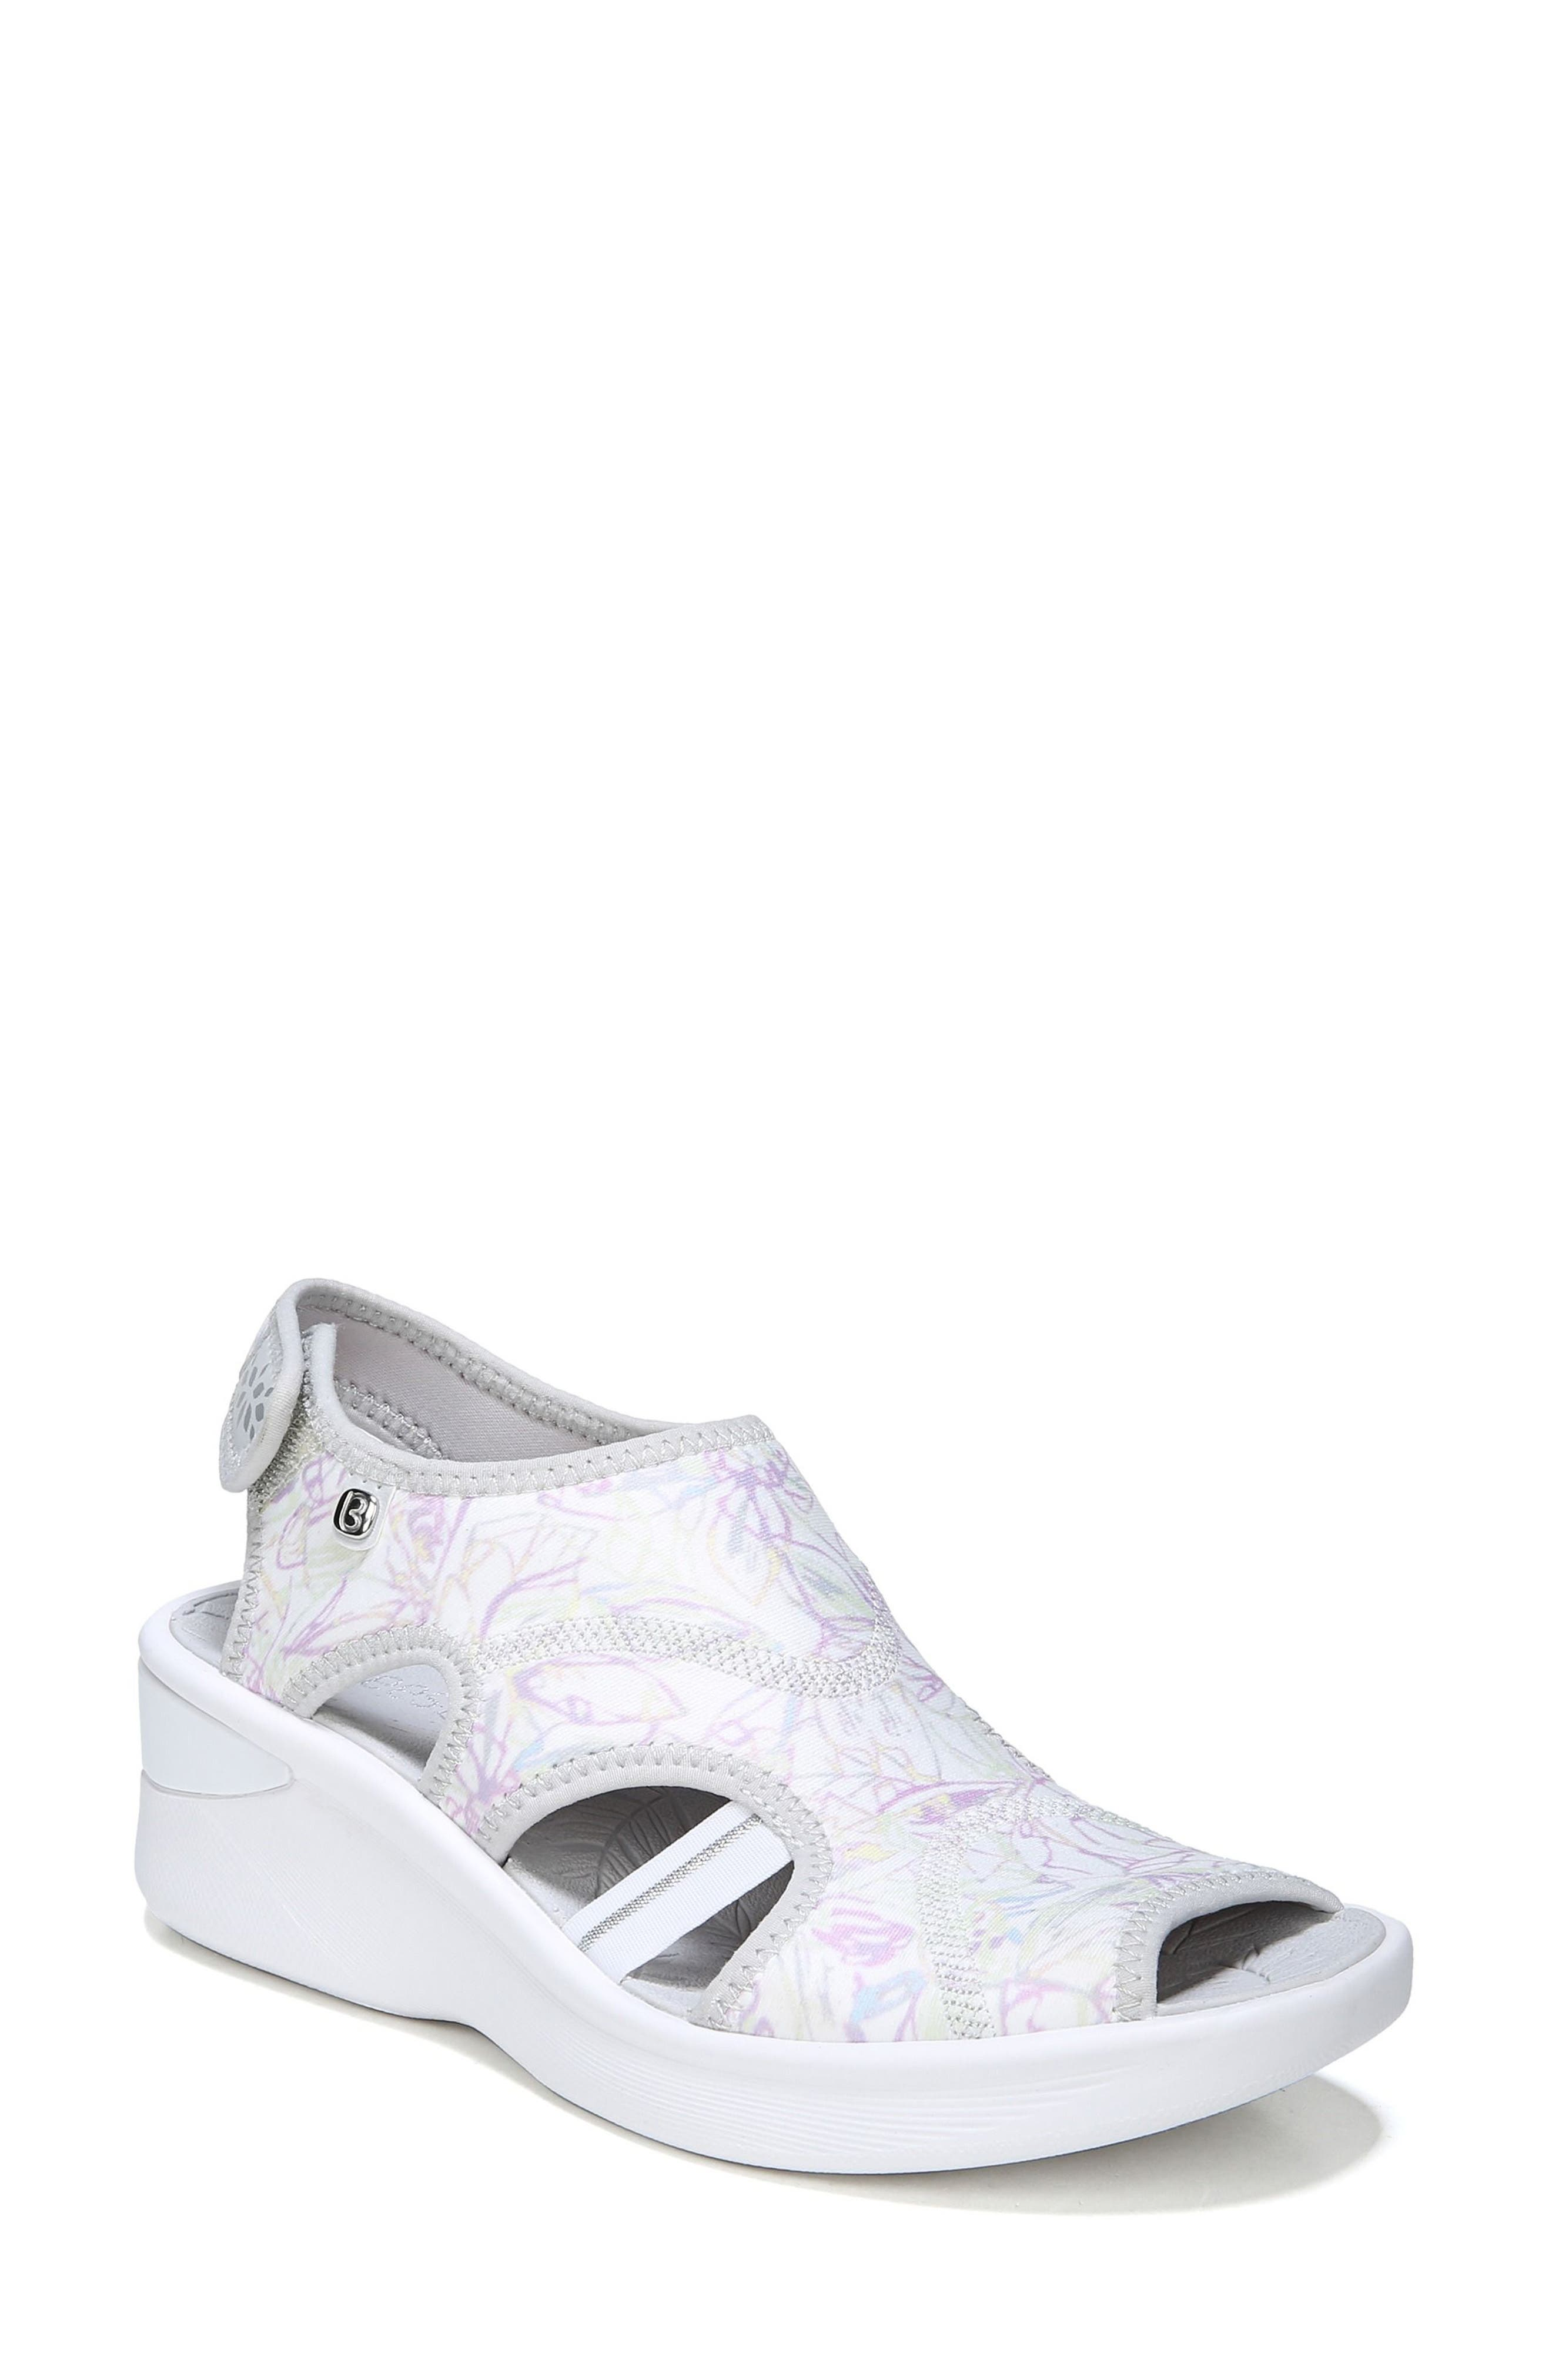 Spirit Sandal,                         Main,                         color, WHITE LEATHER